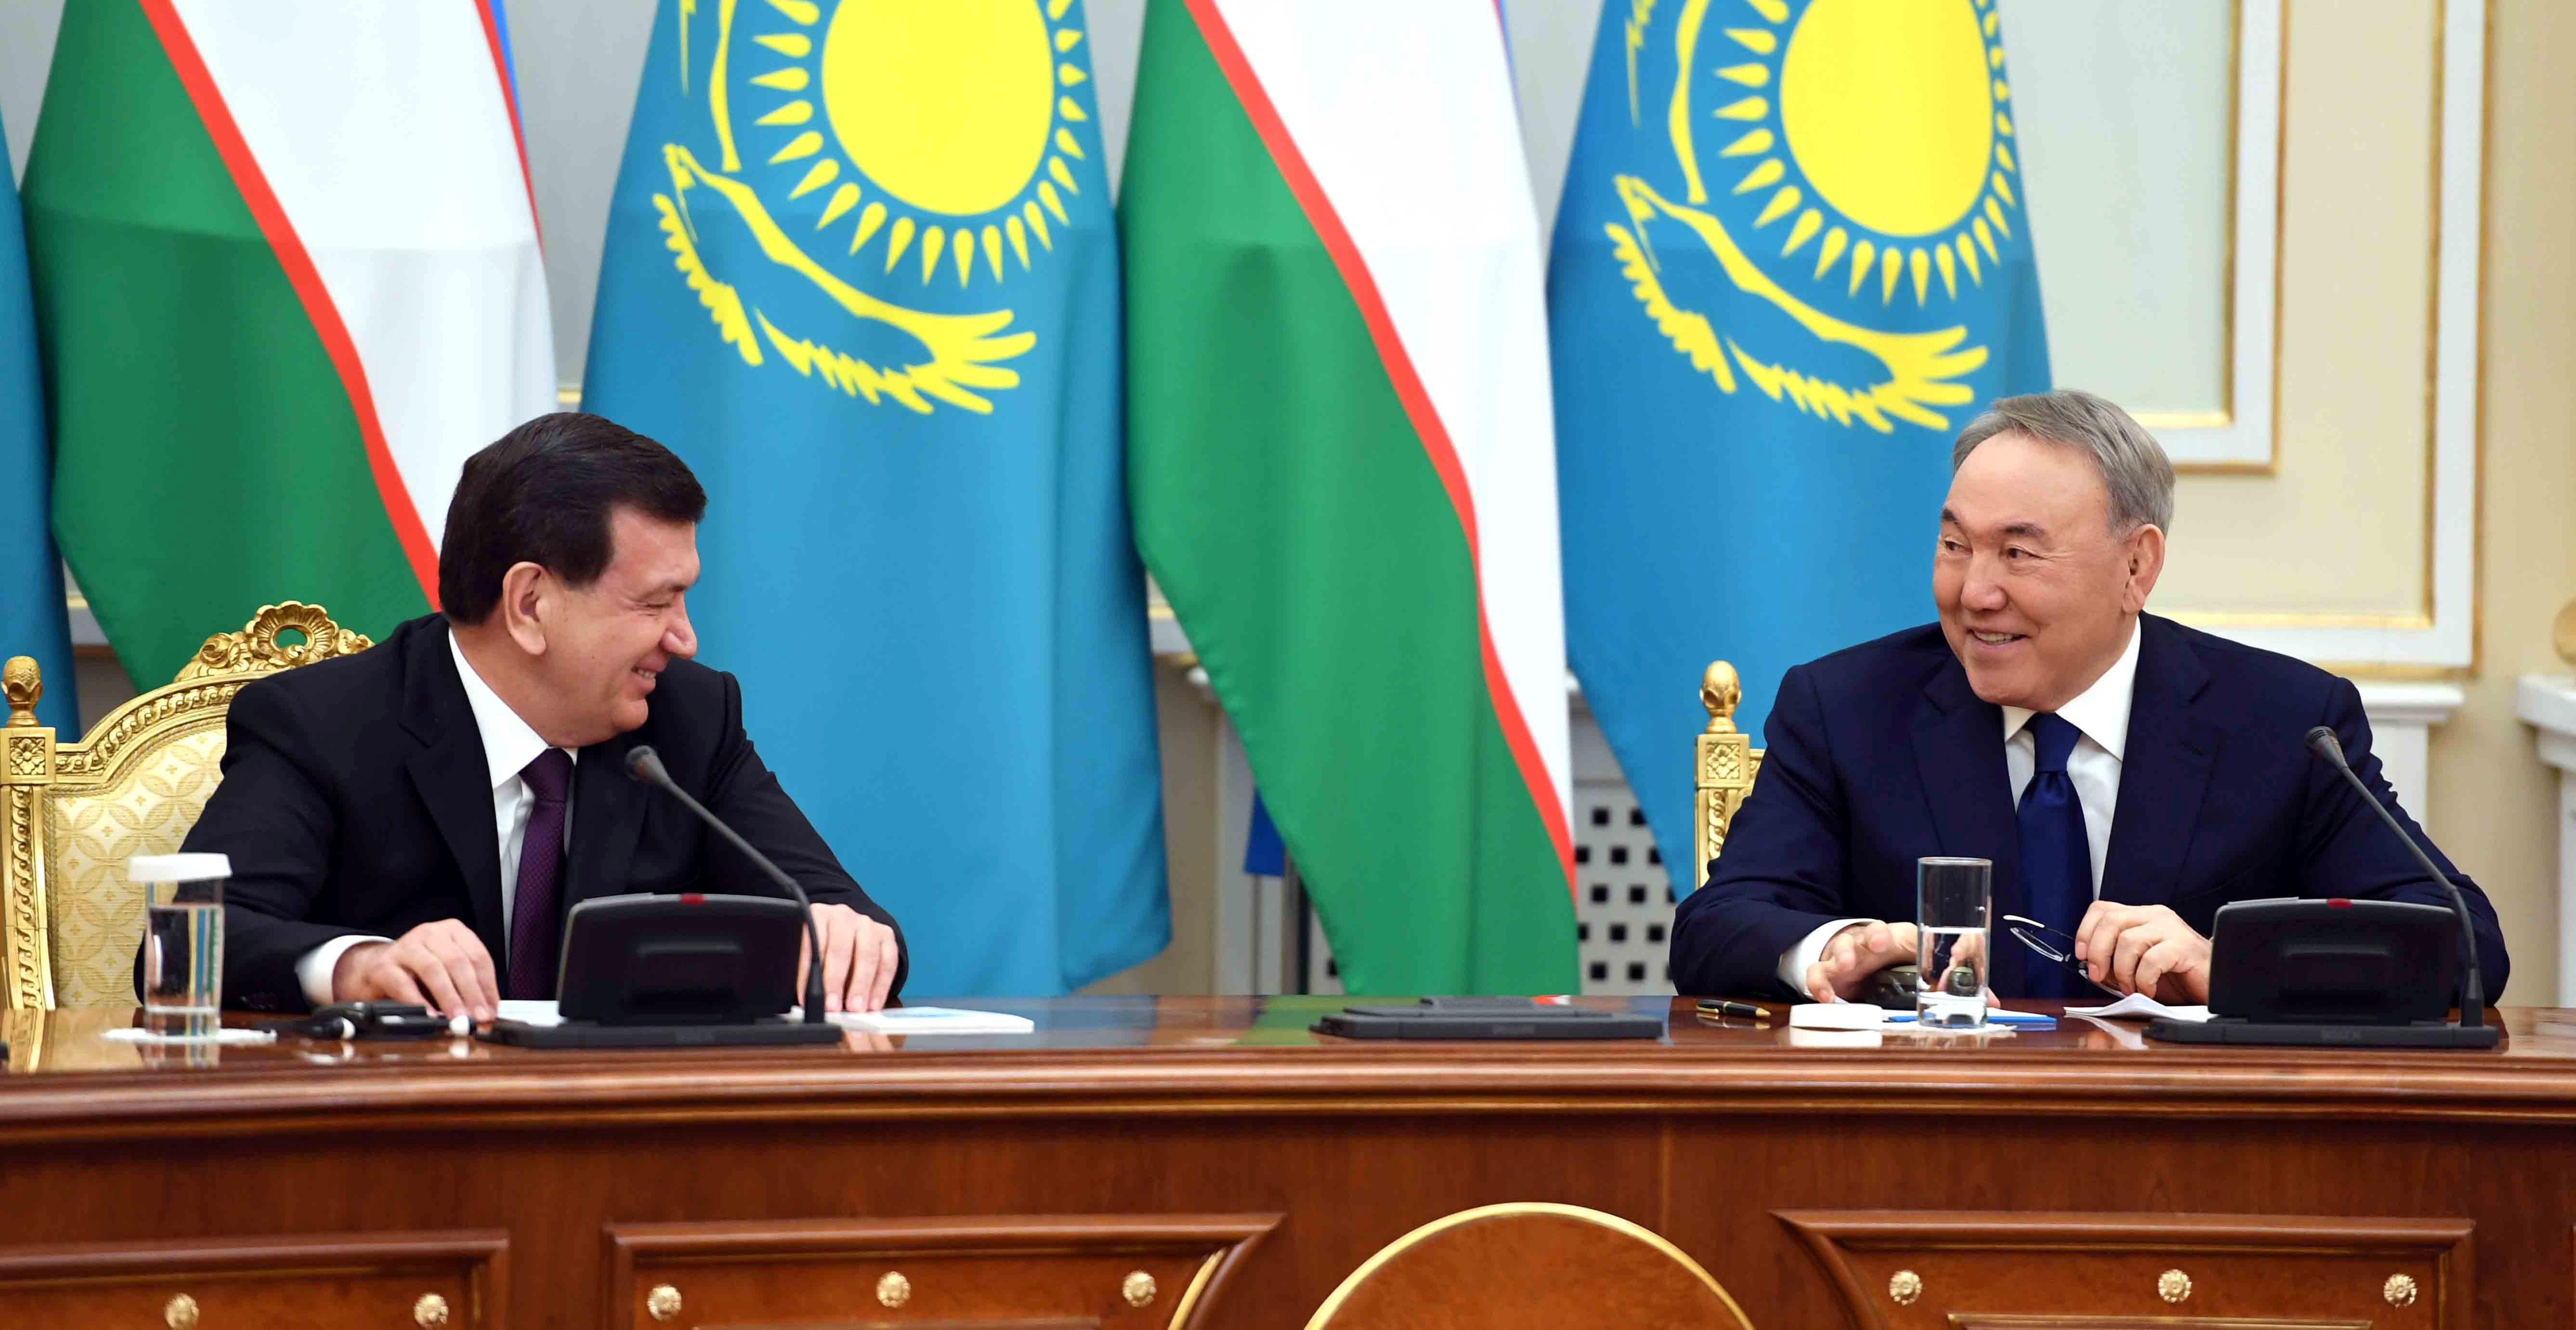 Kazakhstan, Uzbekistan co-operate to boost regional security